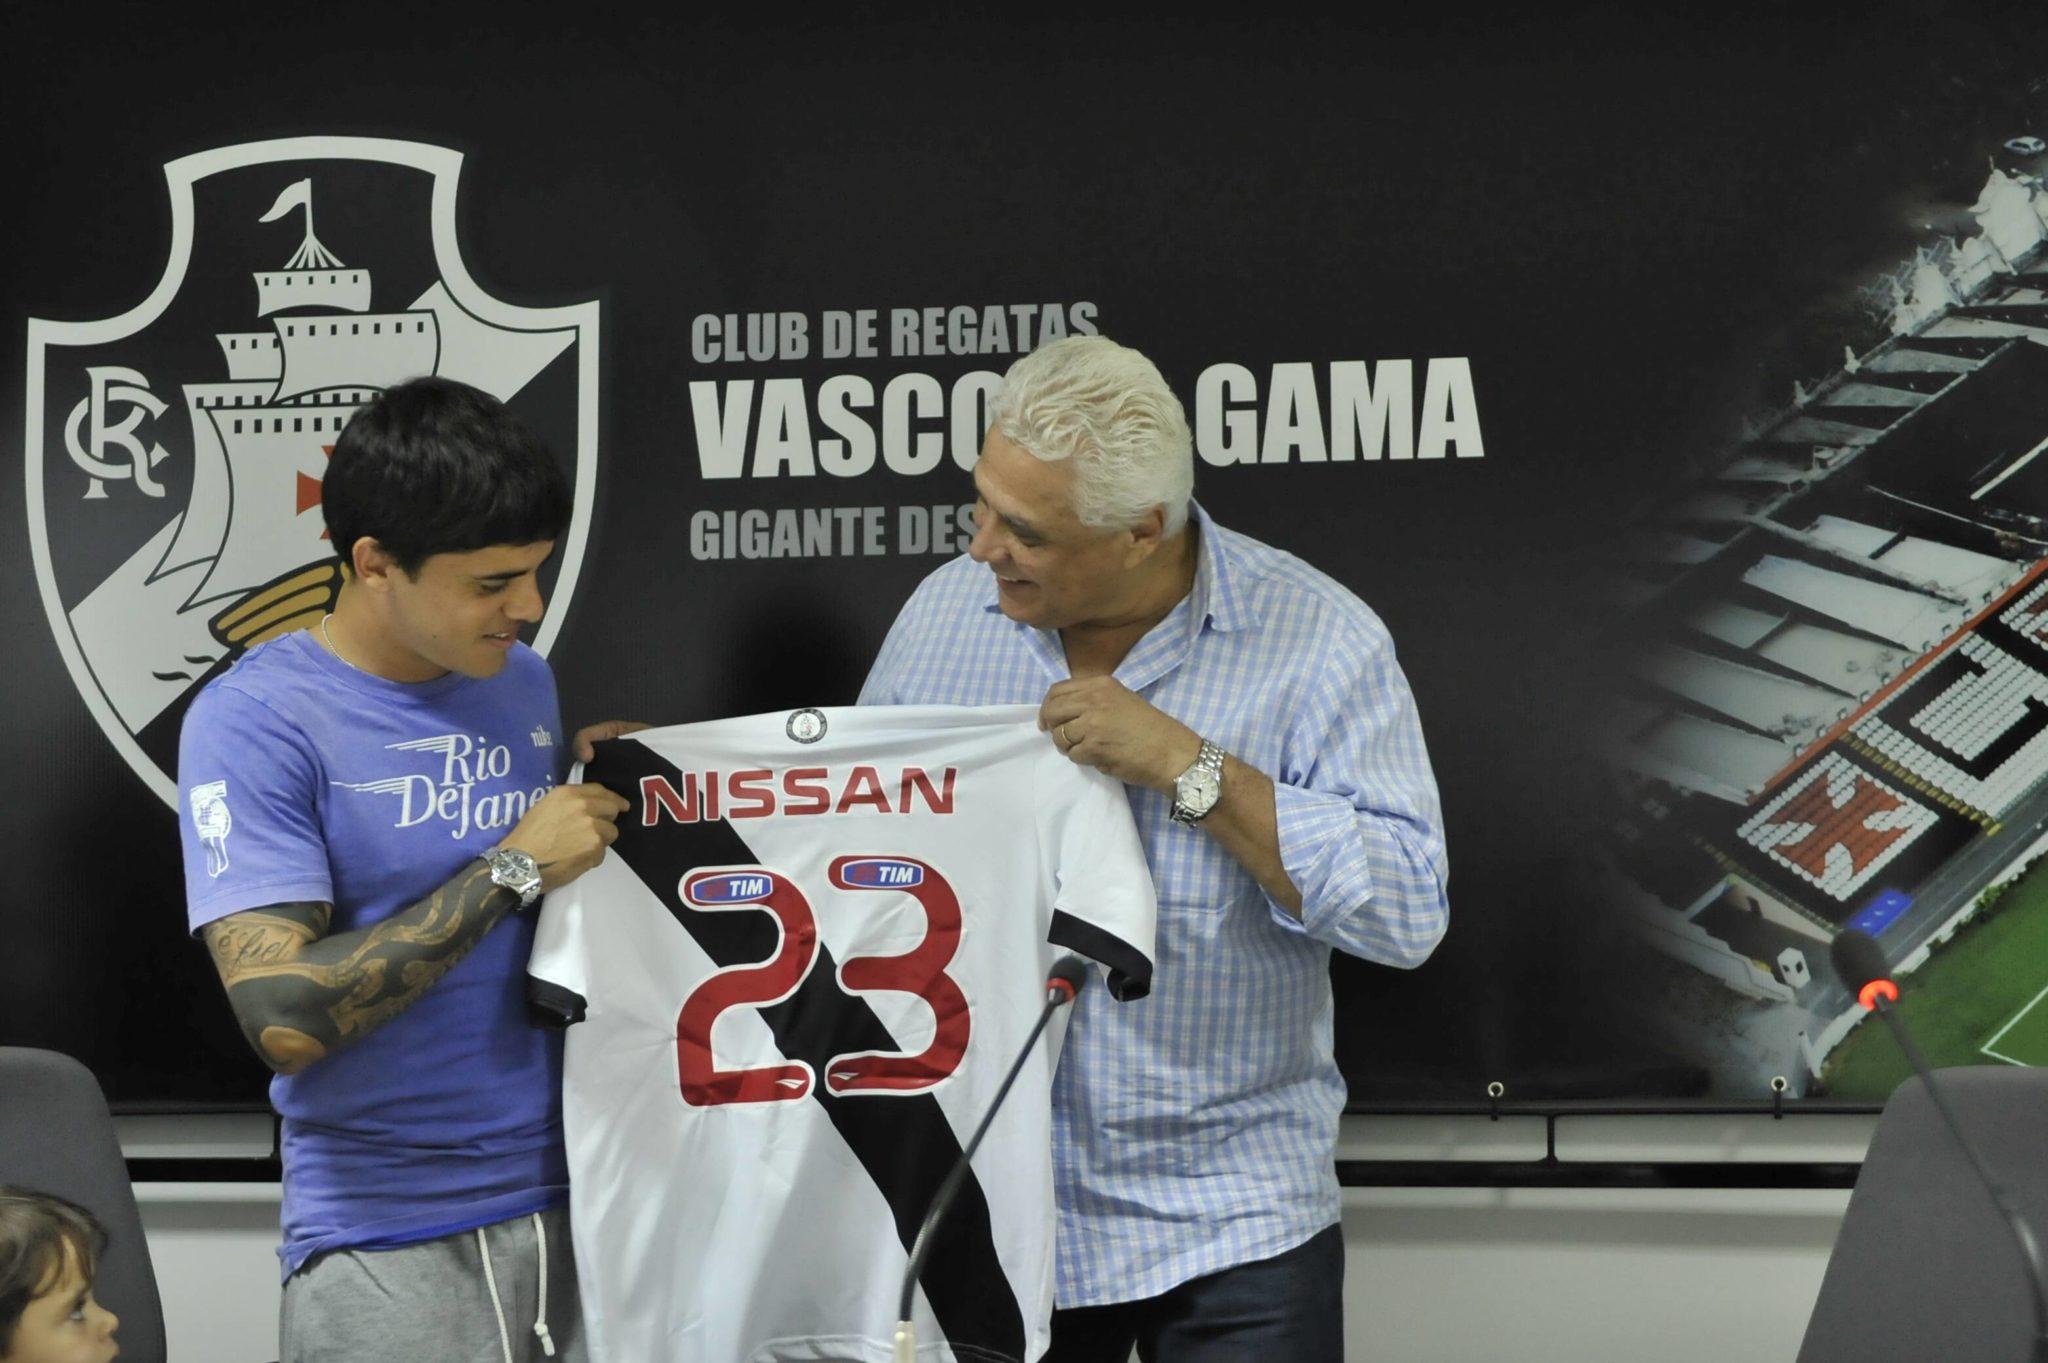 Fagner and Roberto Dinamite at Vasco da Gama in Rio de Janeiro. Image: Imago